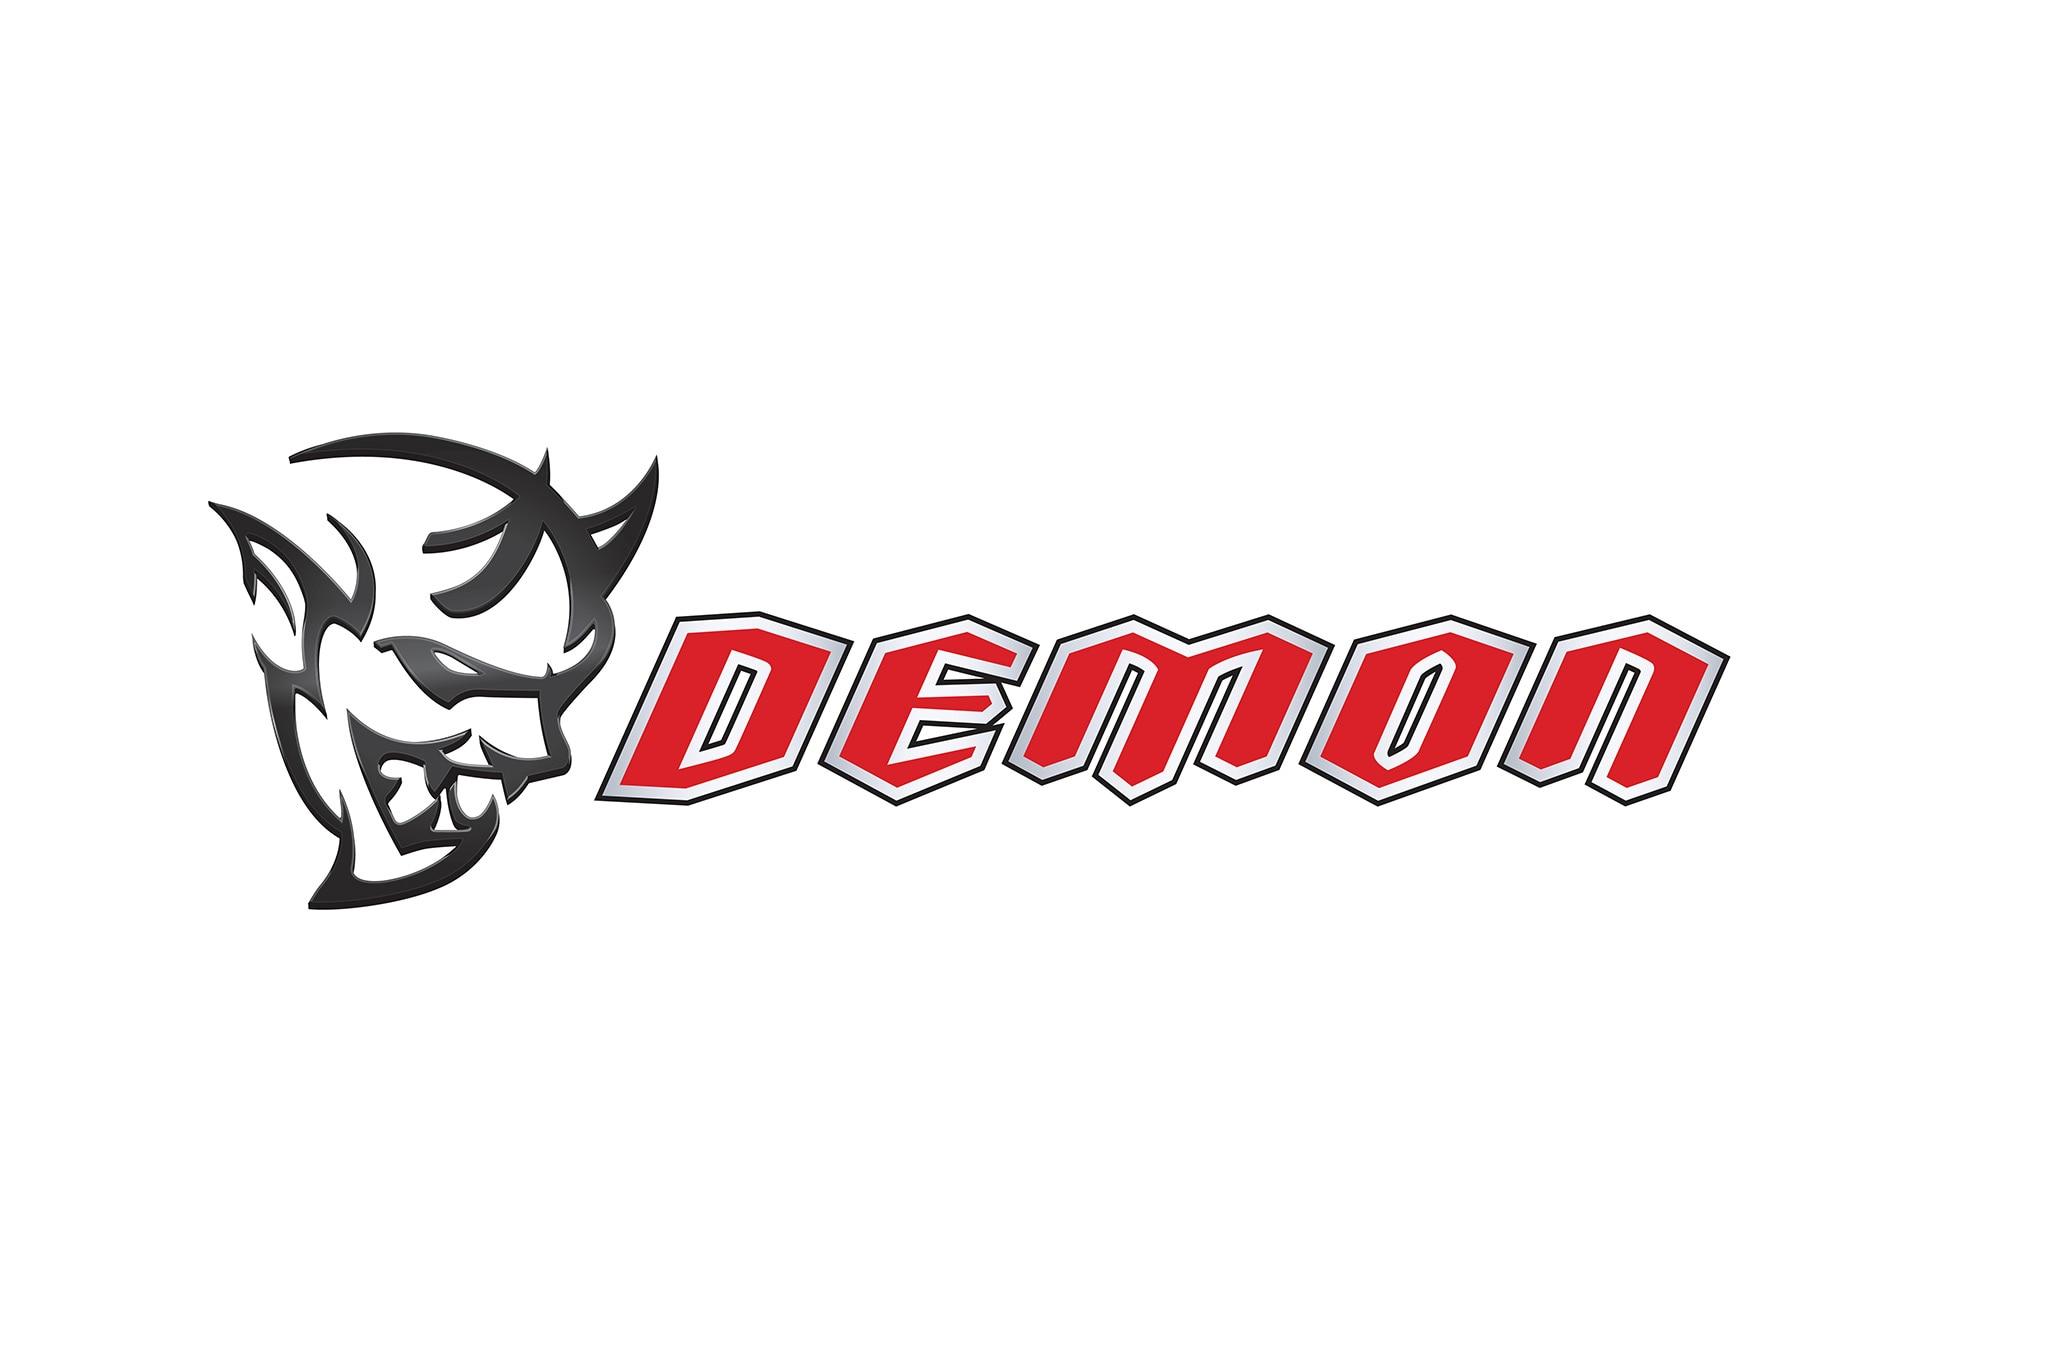 2018 Dodge Challenger SRT Demon Badge Logo